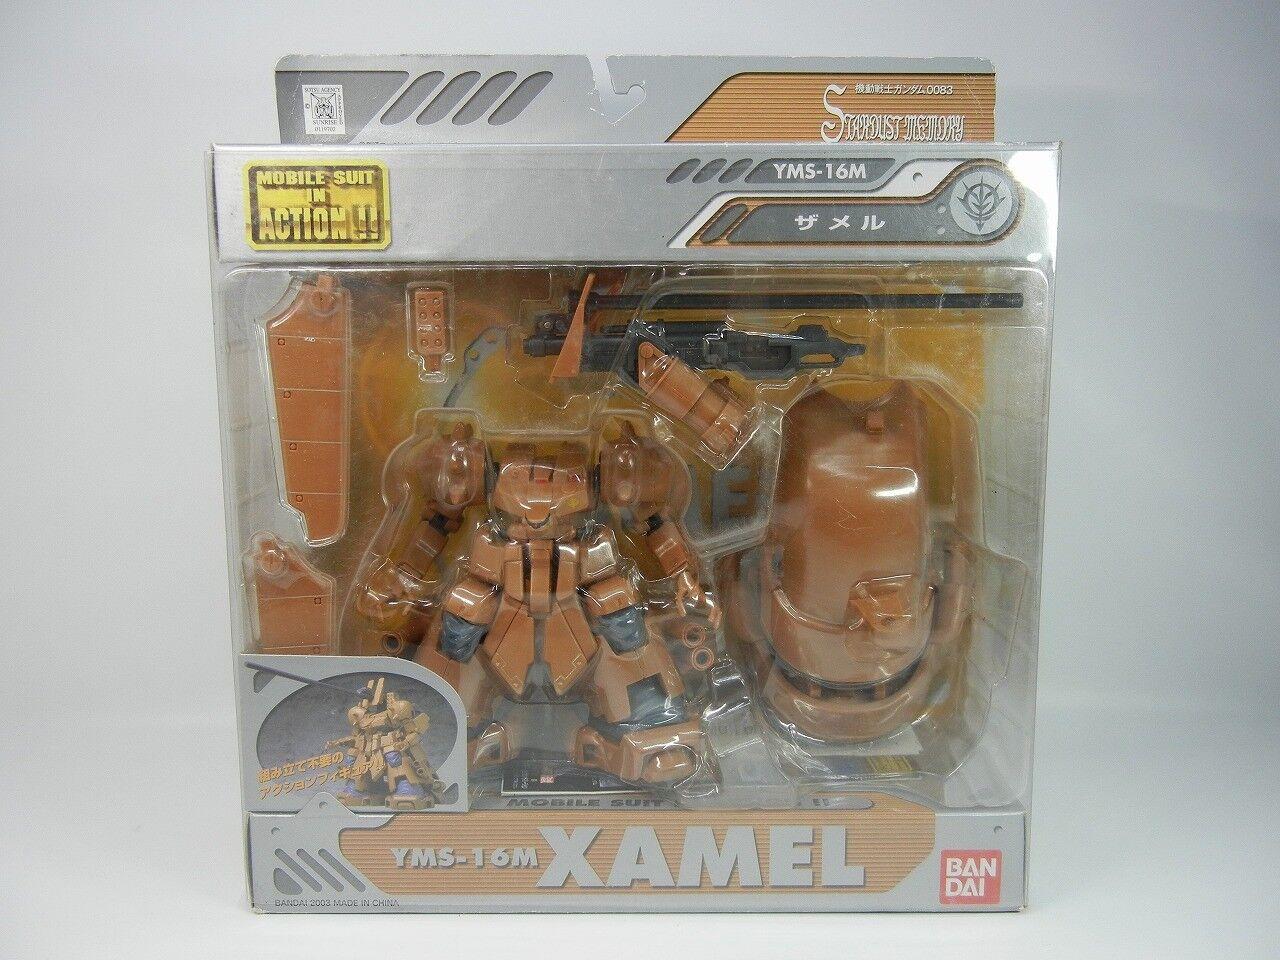 MSIA Gundam 0083   YMS-16M Xamel  Japan ver.   Very rare  azione cifra Beai  qualità ufficiale